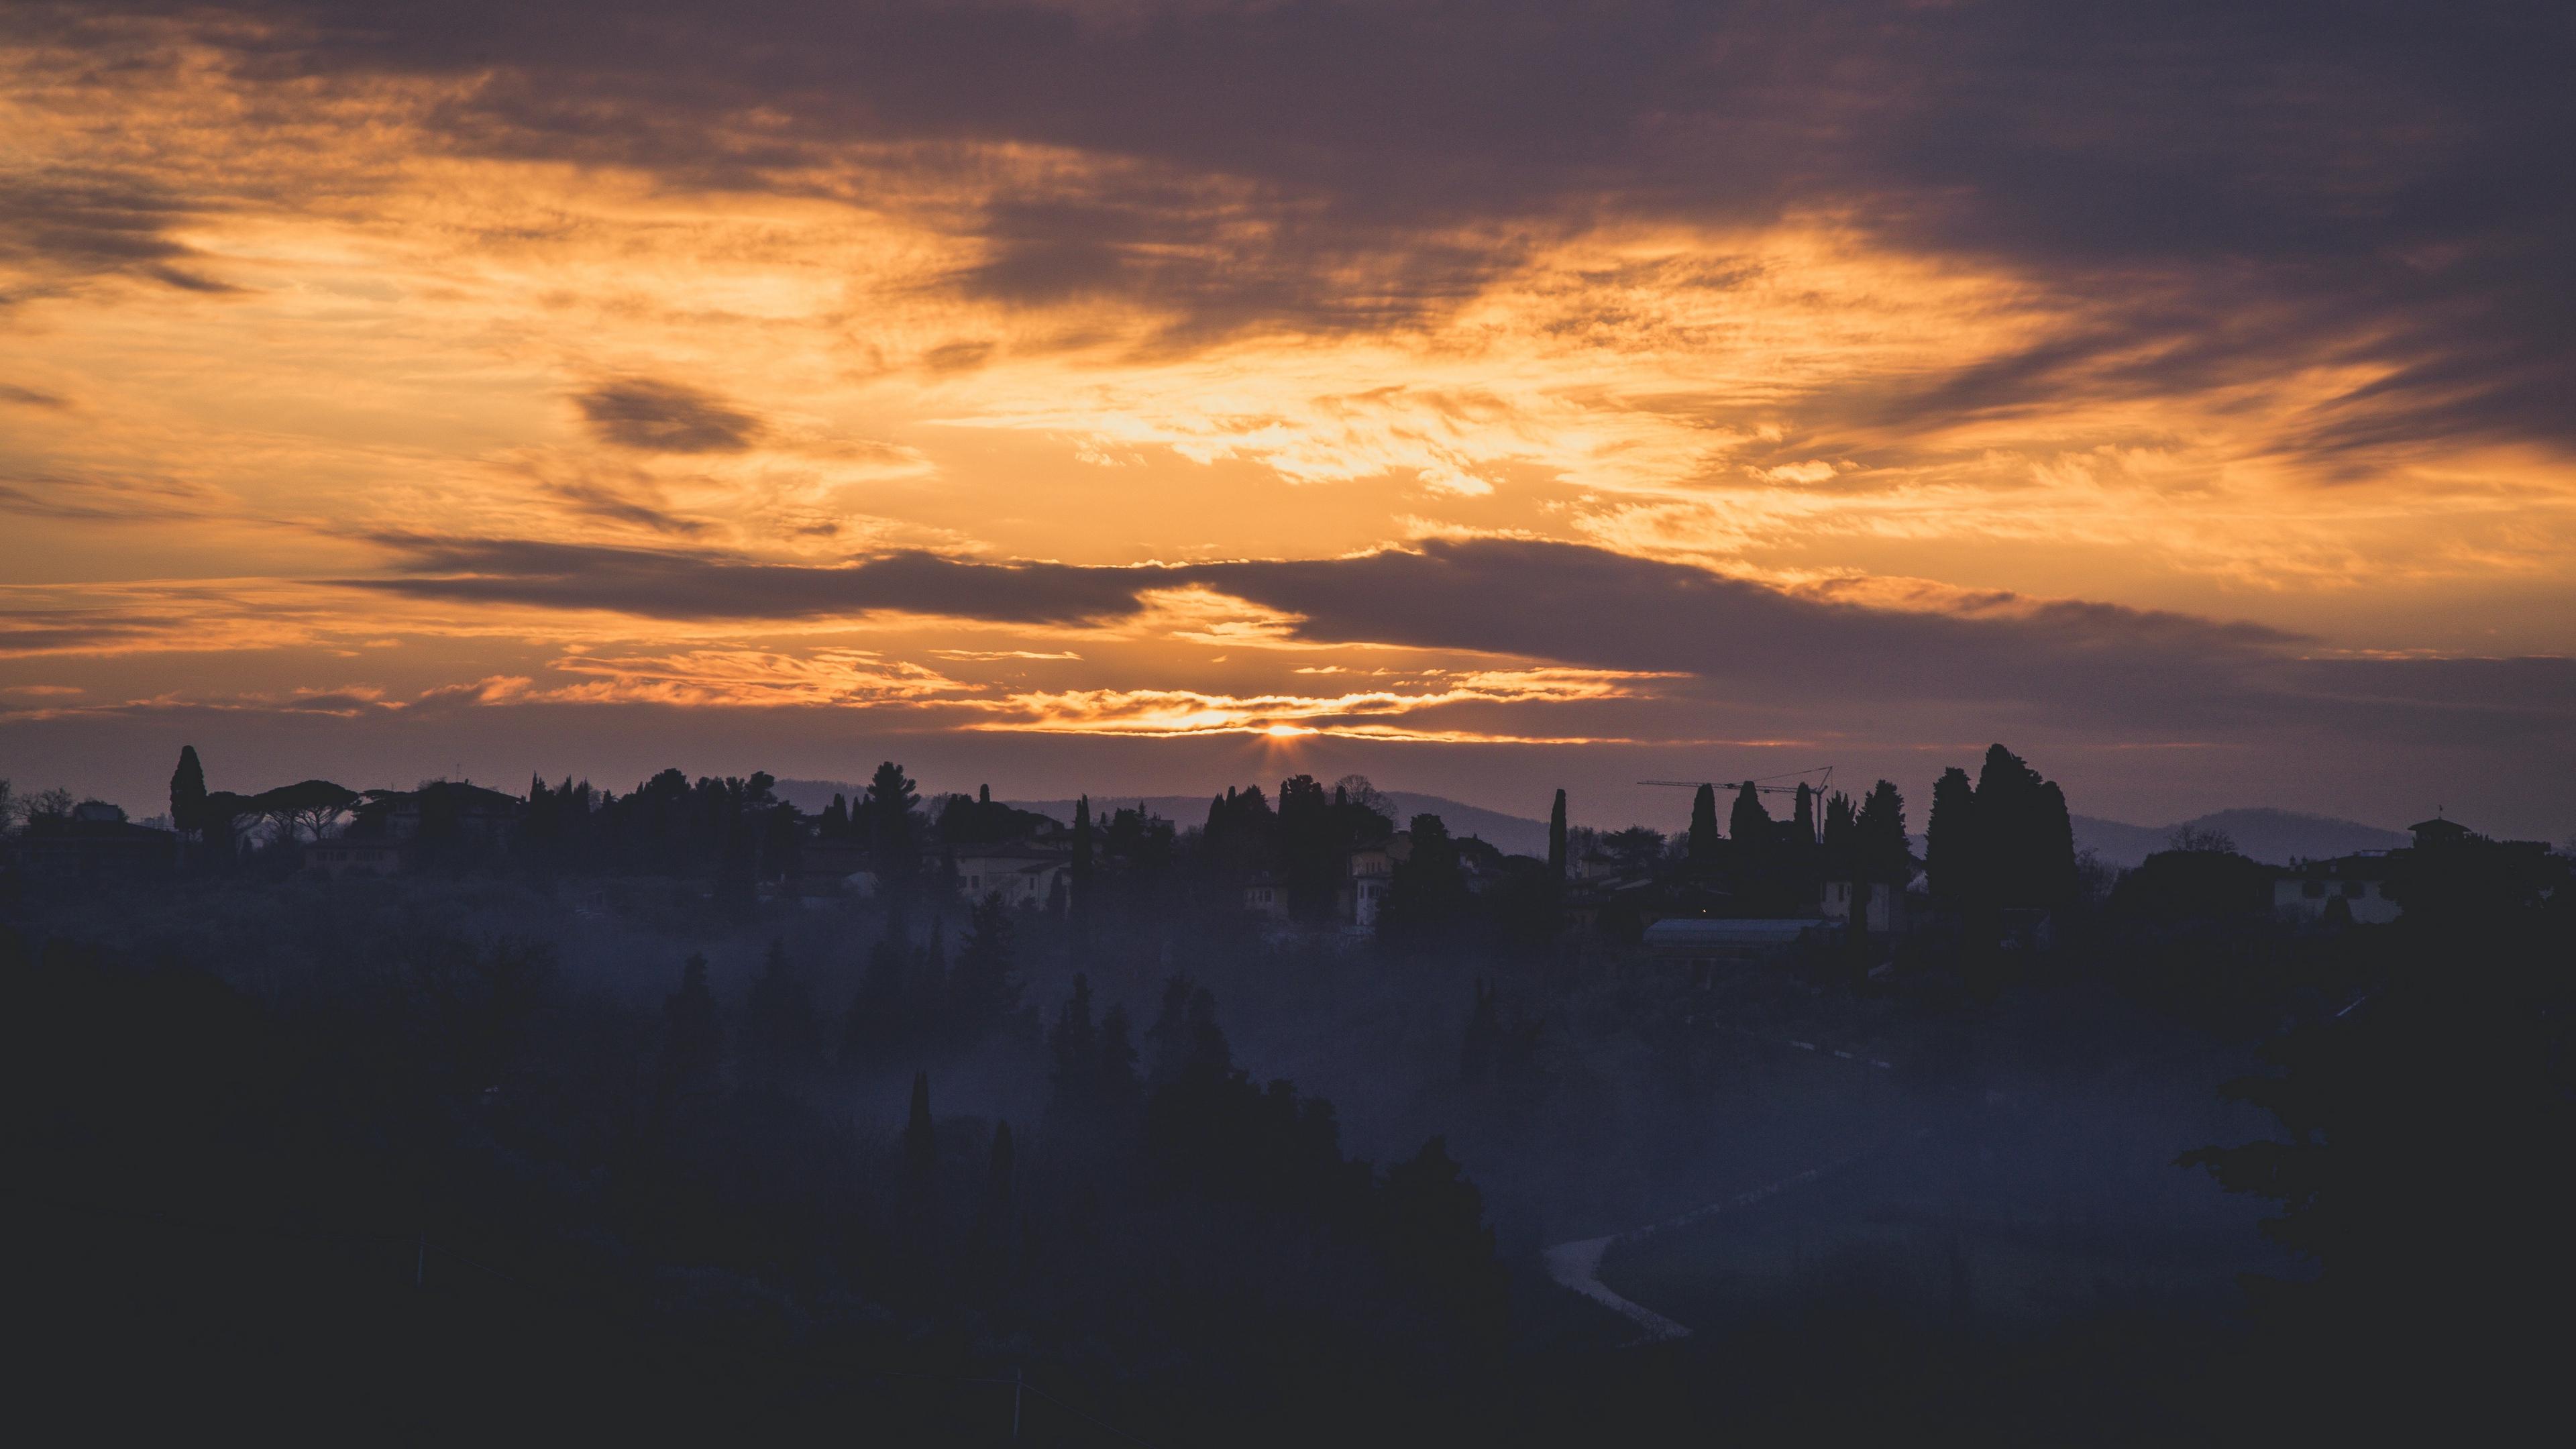 italy florence fog dawn sky 4k 1541117849 - italy, florence, fog, dawn, sky 4k - Italy, fog, florence